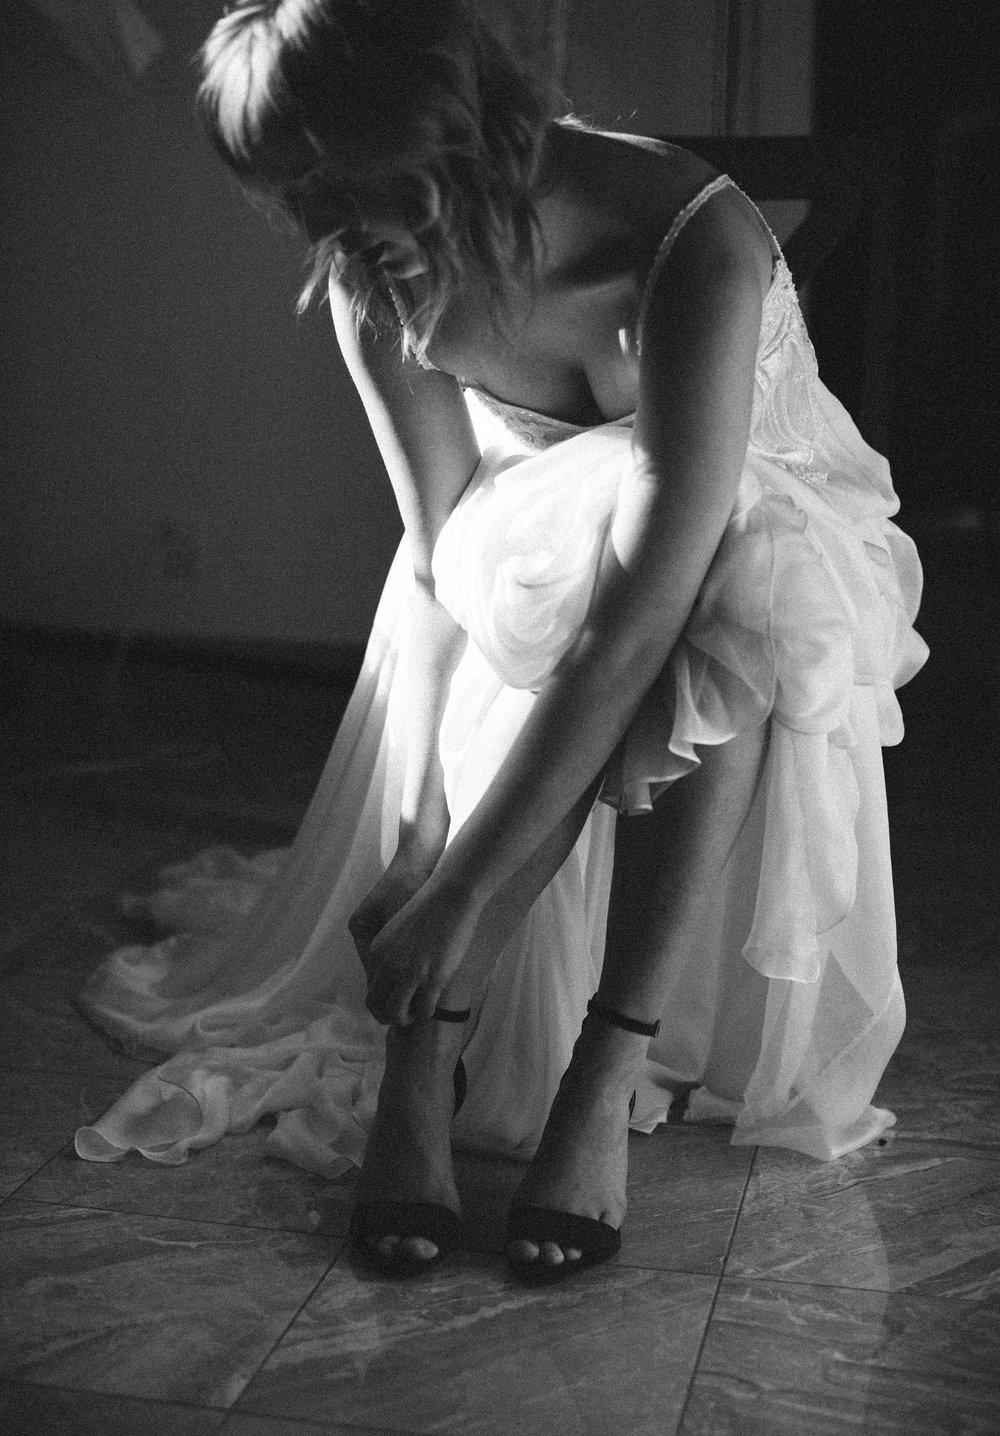 D52A0182STYLED_WEDDING_PORTLAND_QUAILHURSTJENNYCHOKBENGBOUNPORTLANDWEDDINGPHOTOGRAPHER.jpg